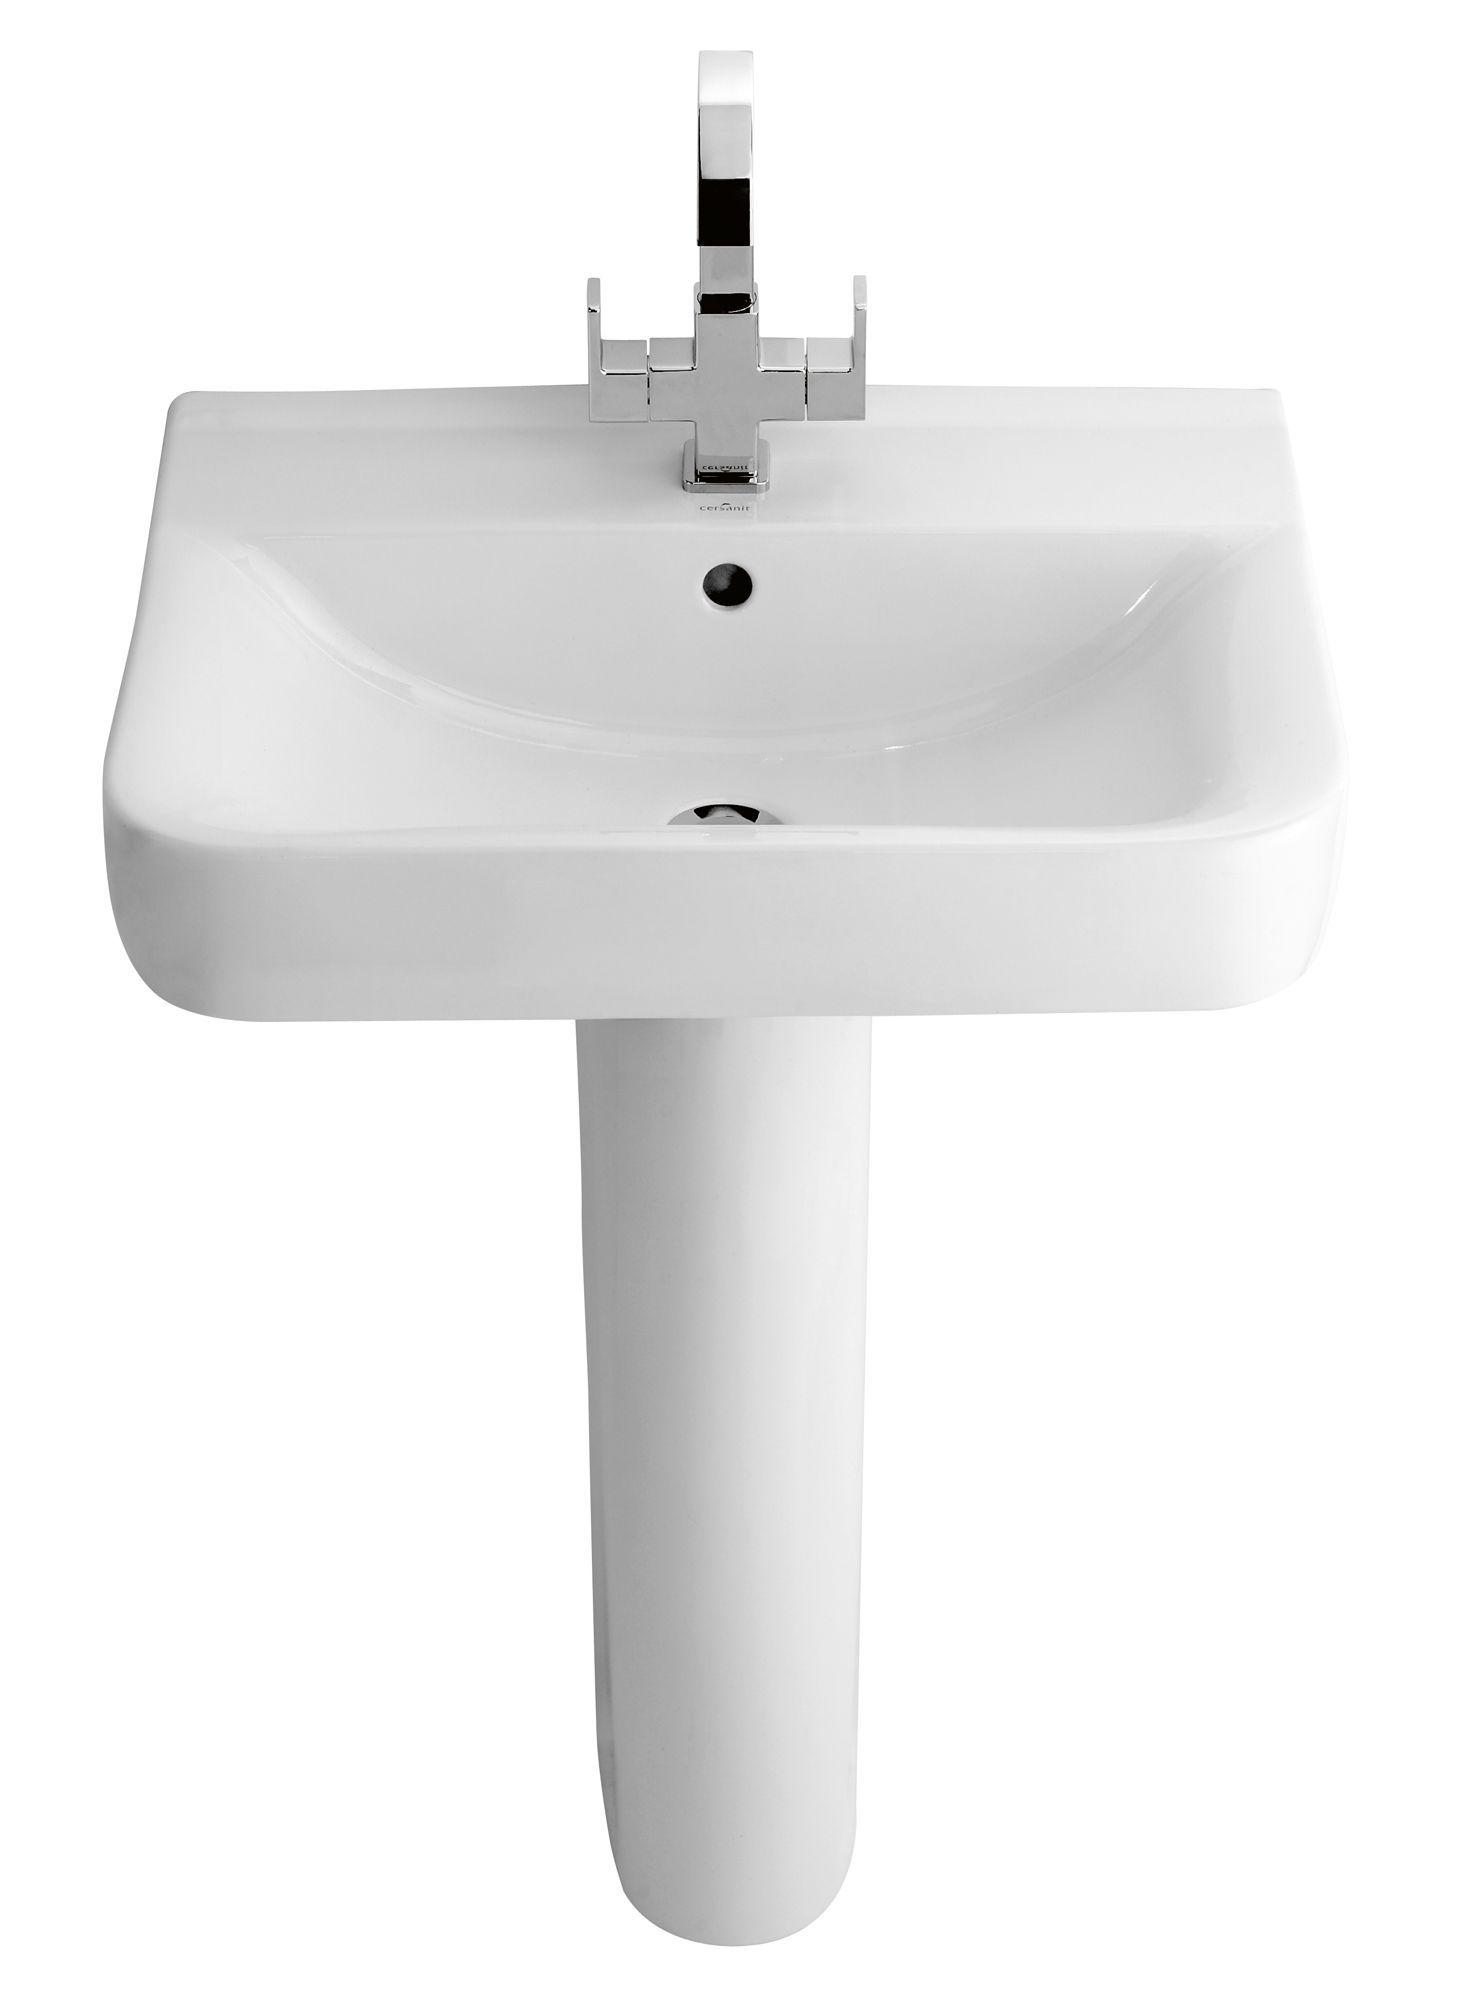 Bathroom Sinks B&Q Ireland cooke & lewis luciana full pedestal basin | departments | diy at b&q